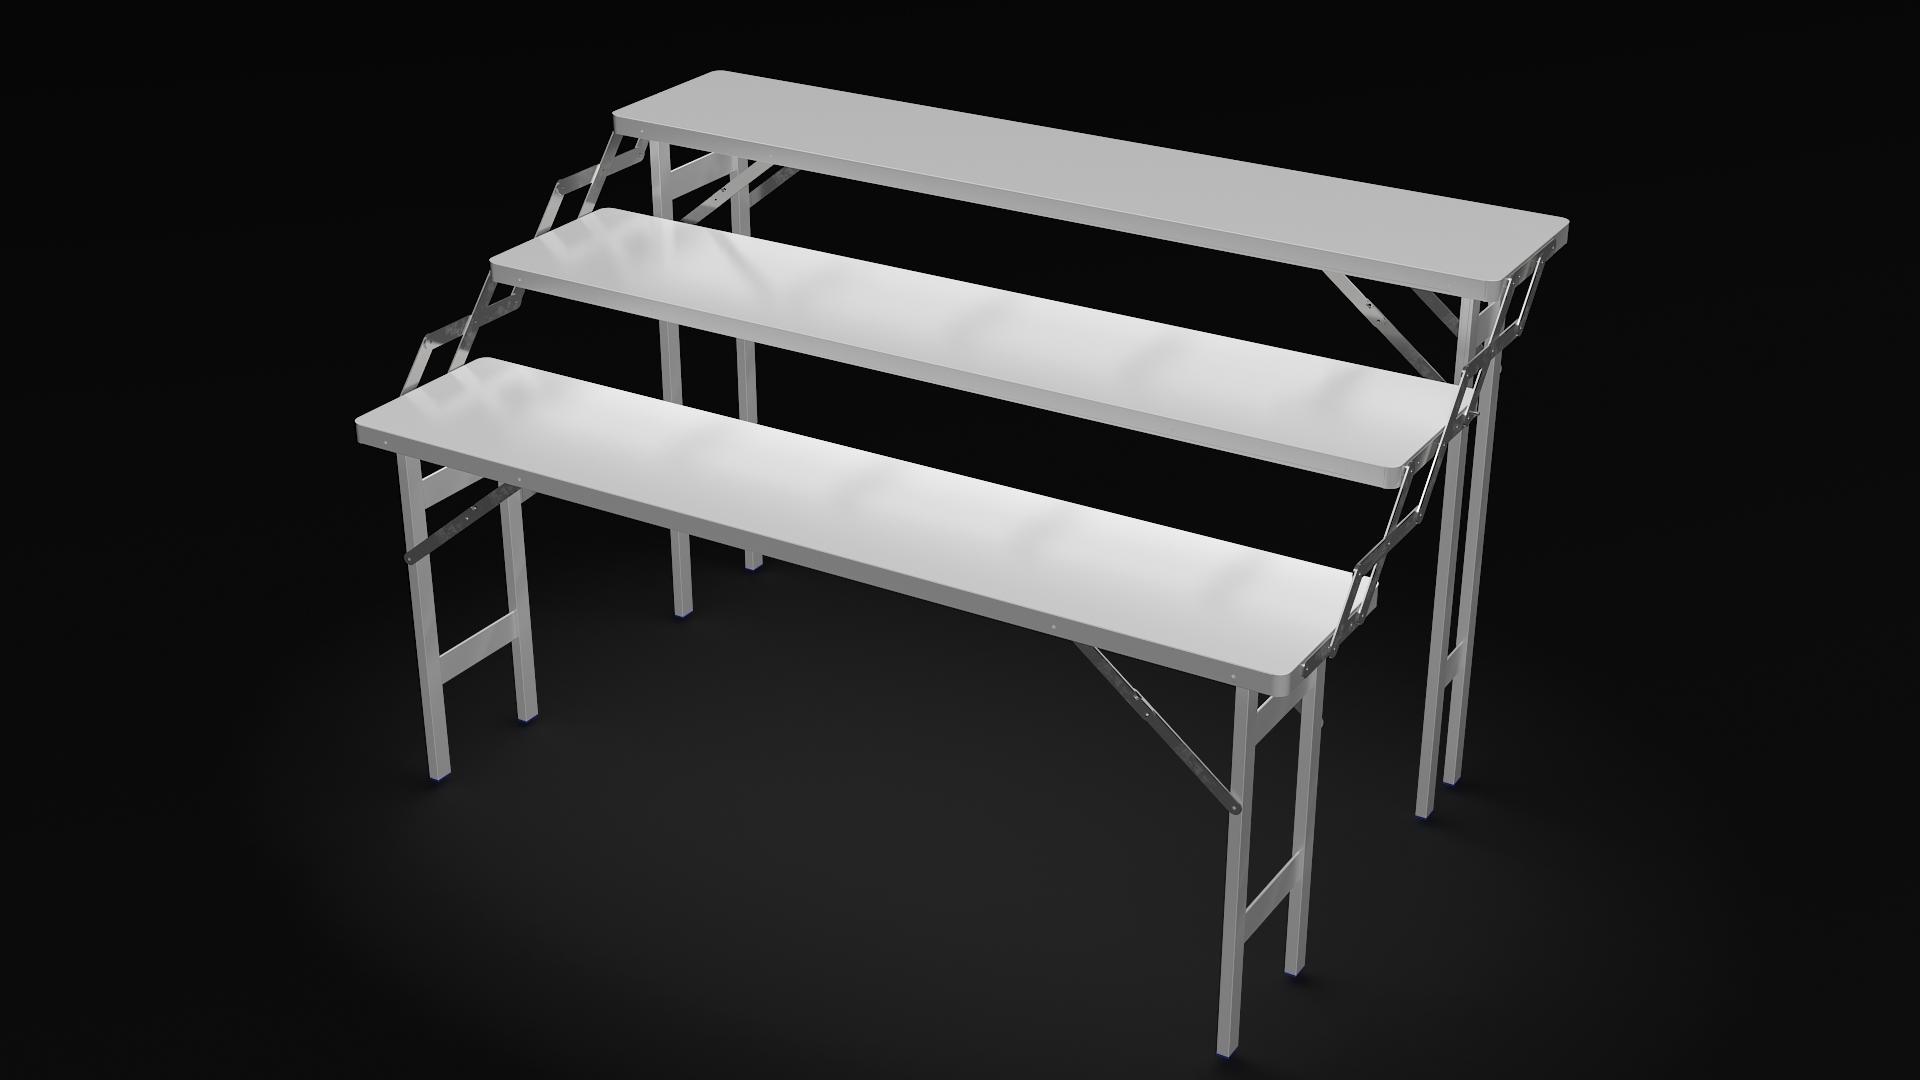 Table En Alu Escalier 3 Niveau